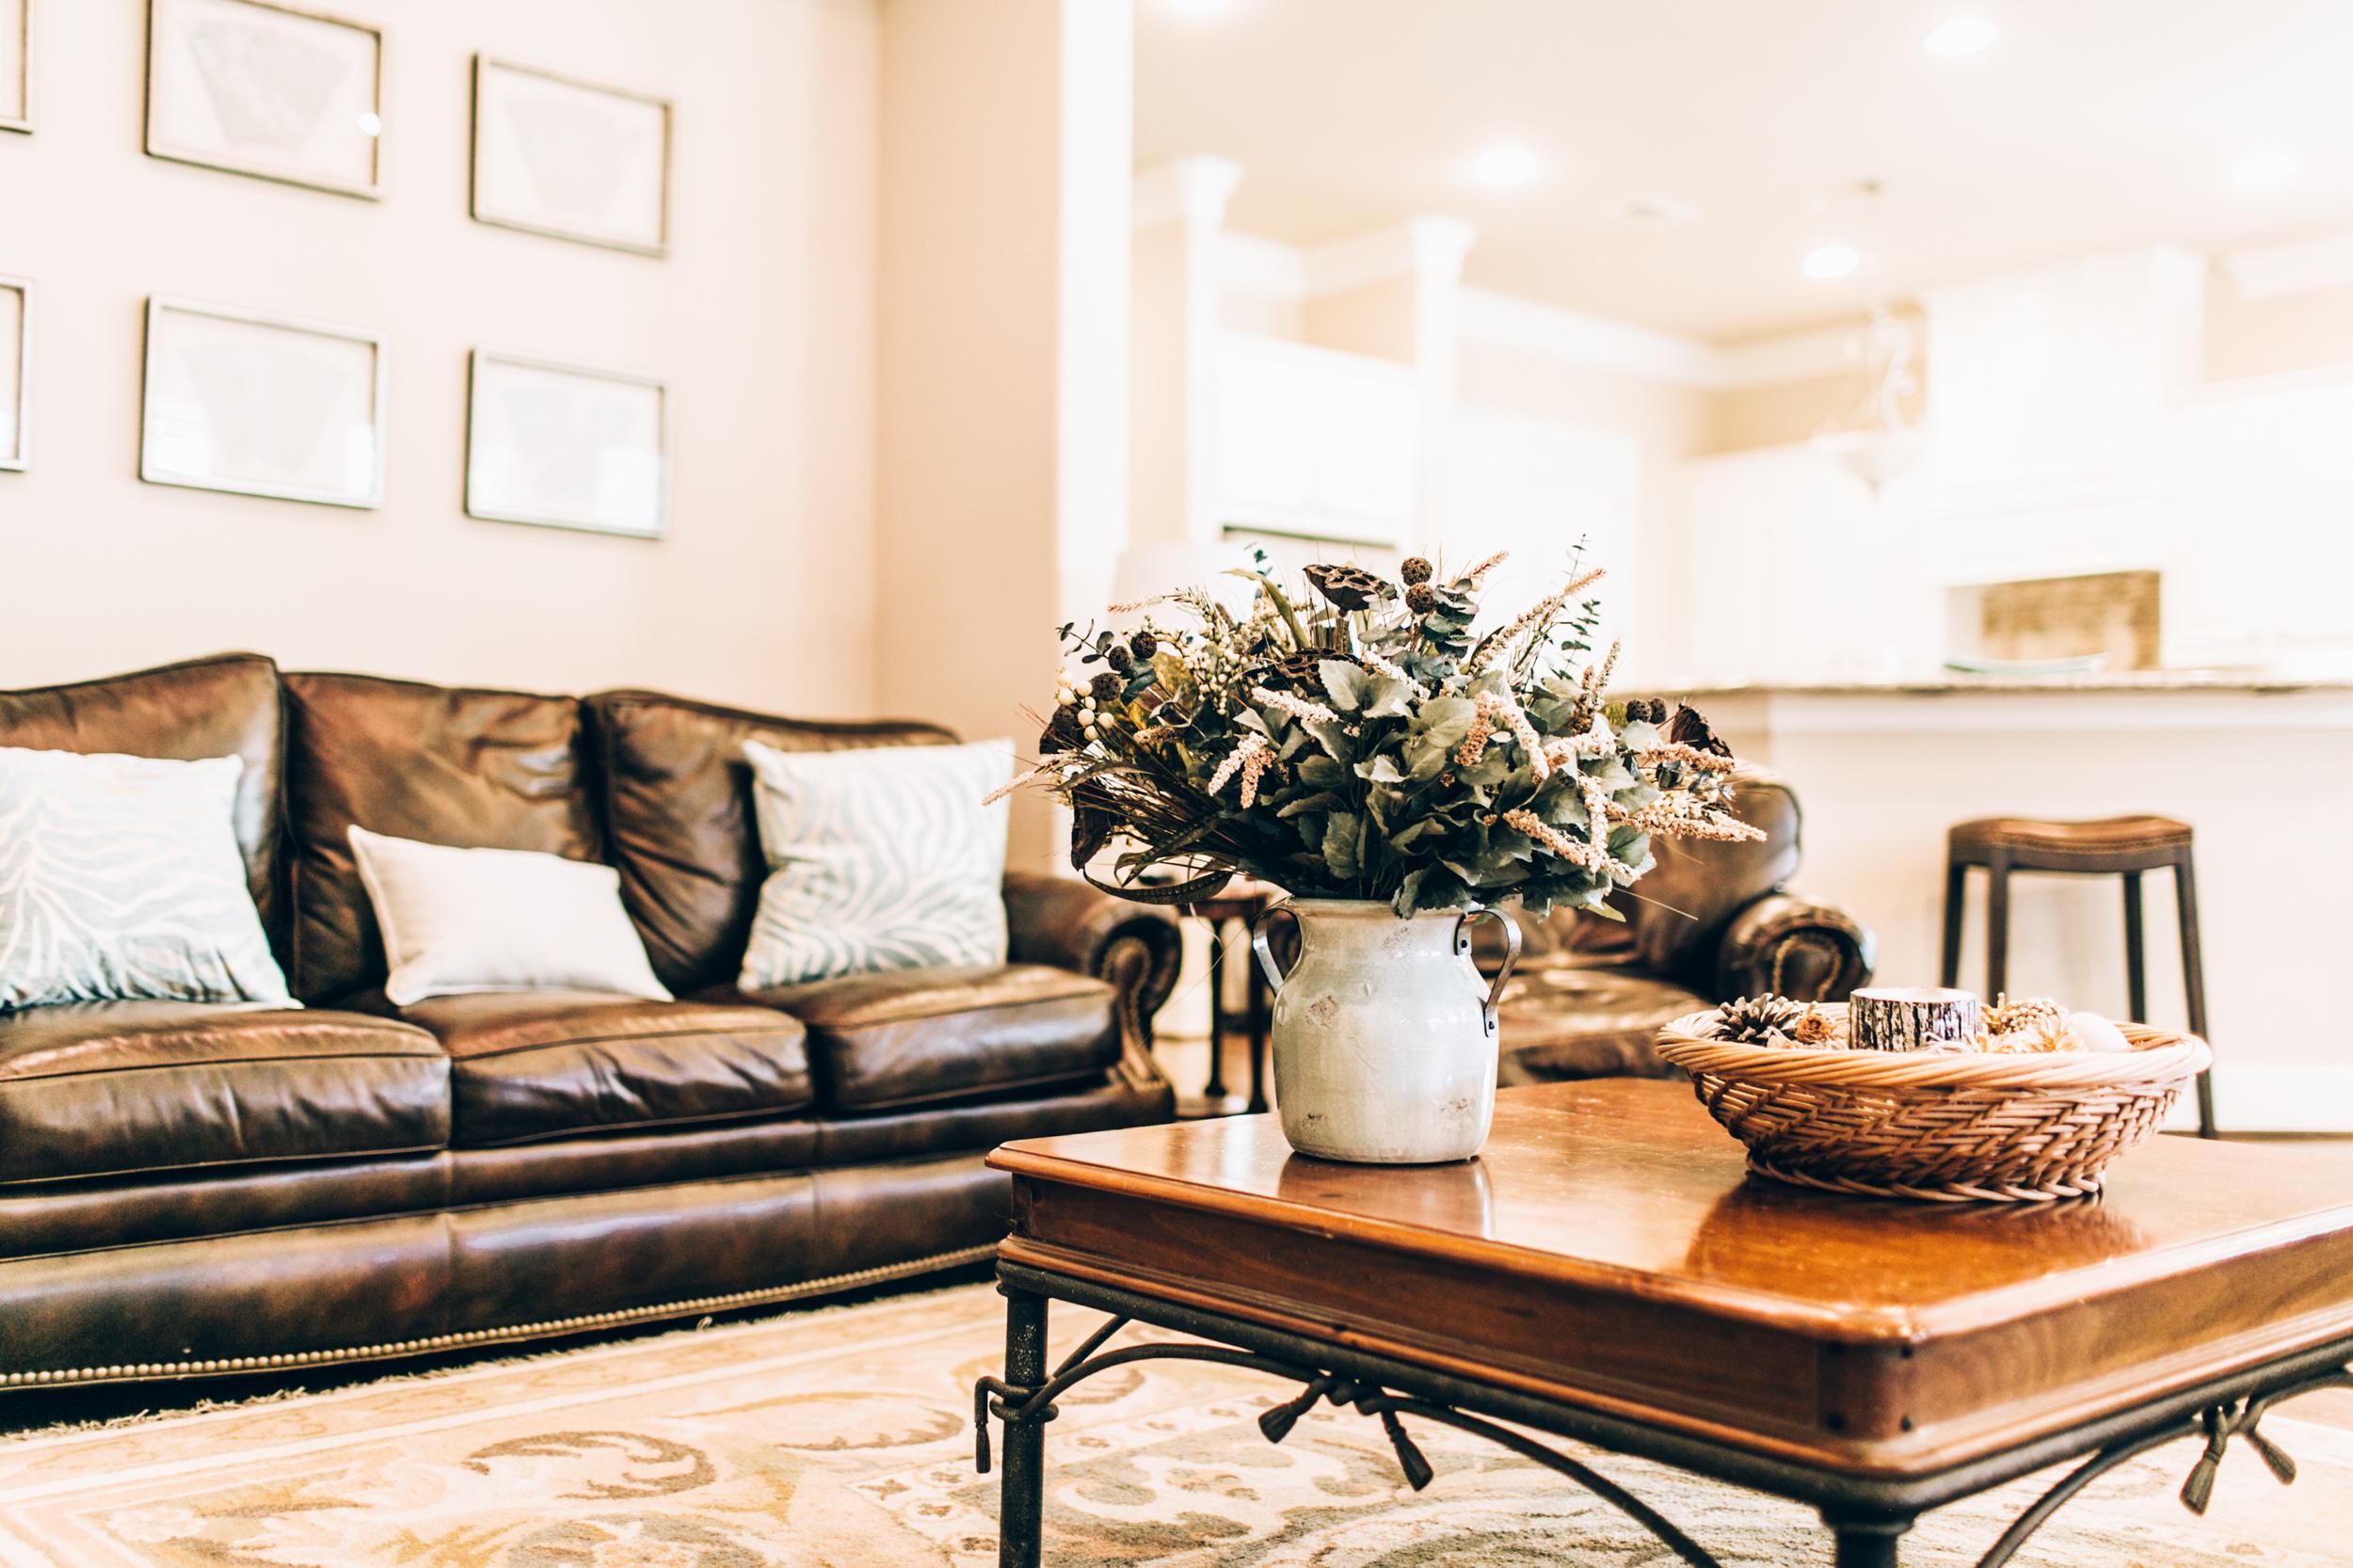 interior-design-home-decorating-338.jpg